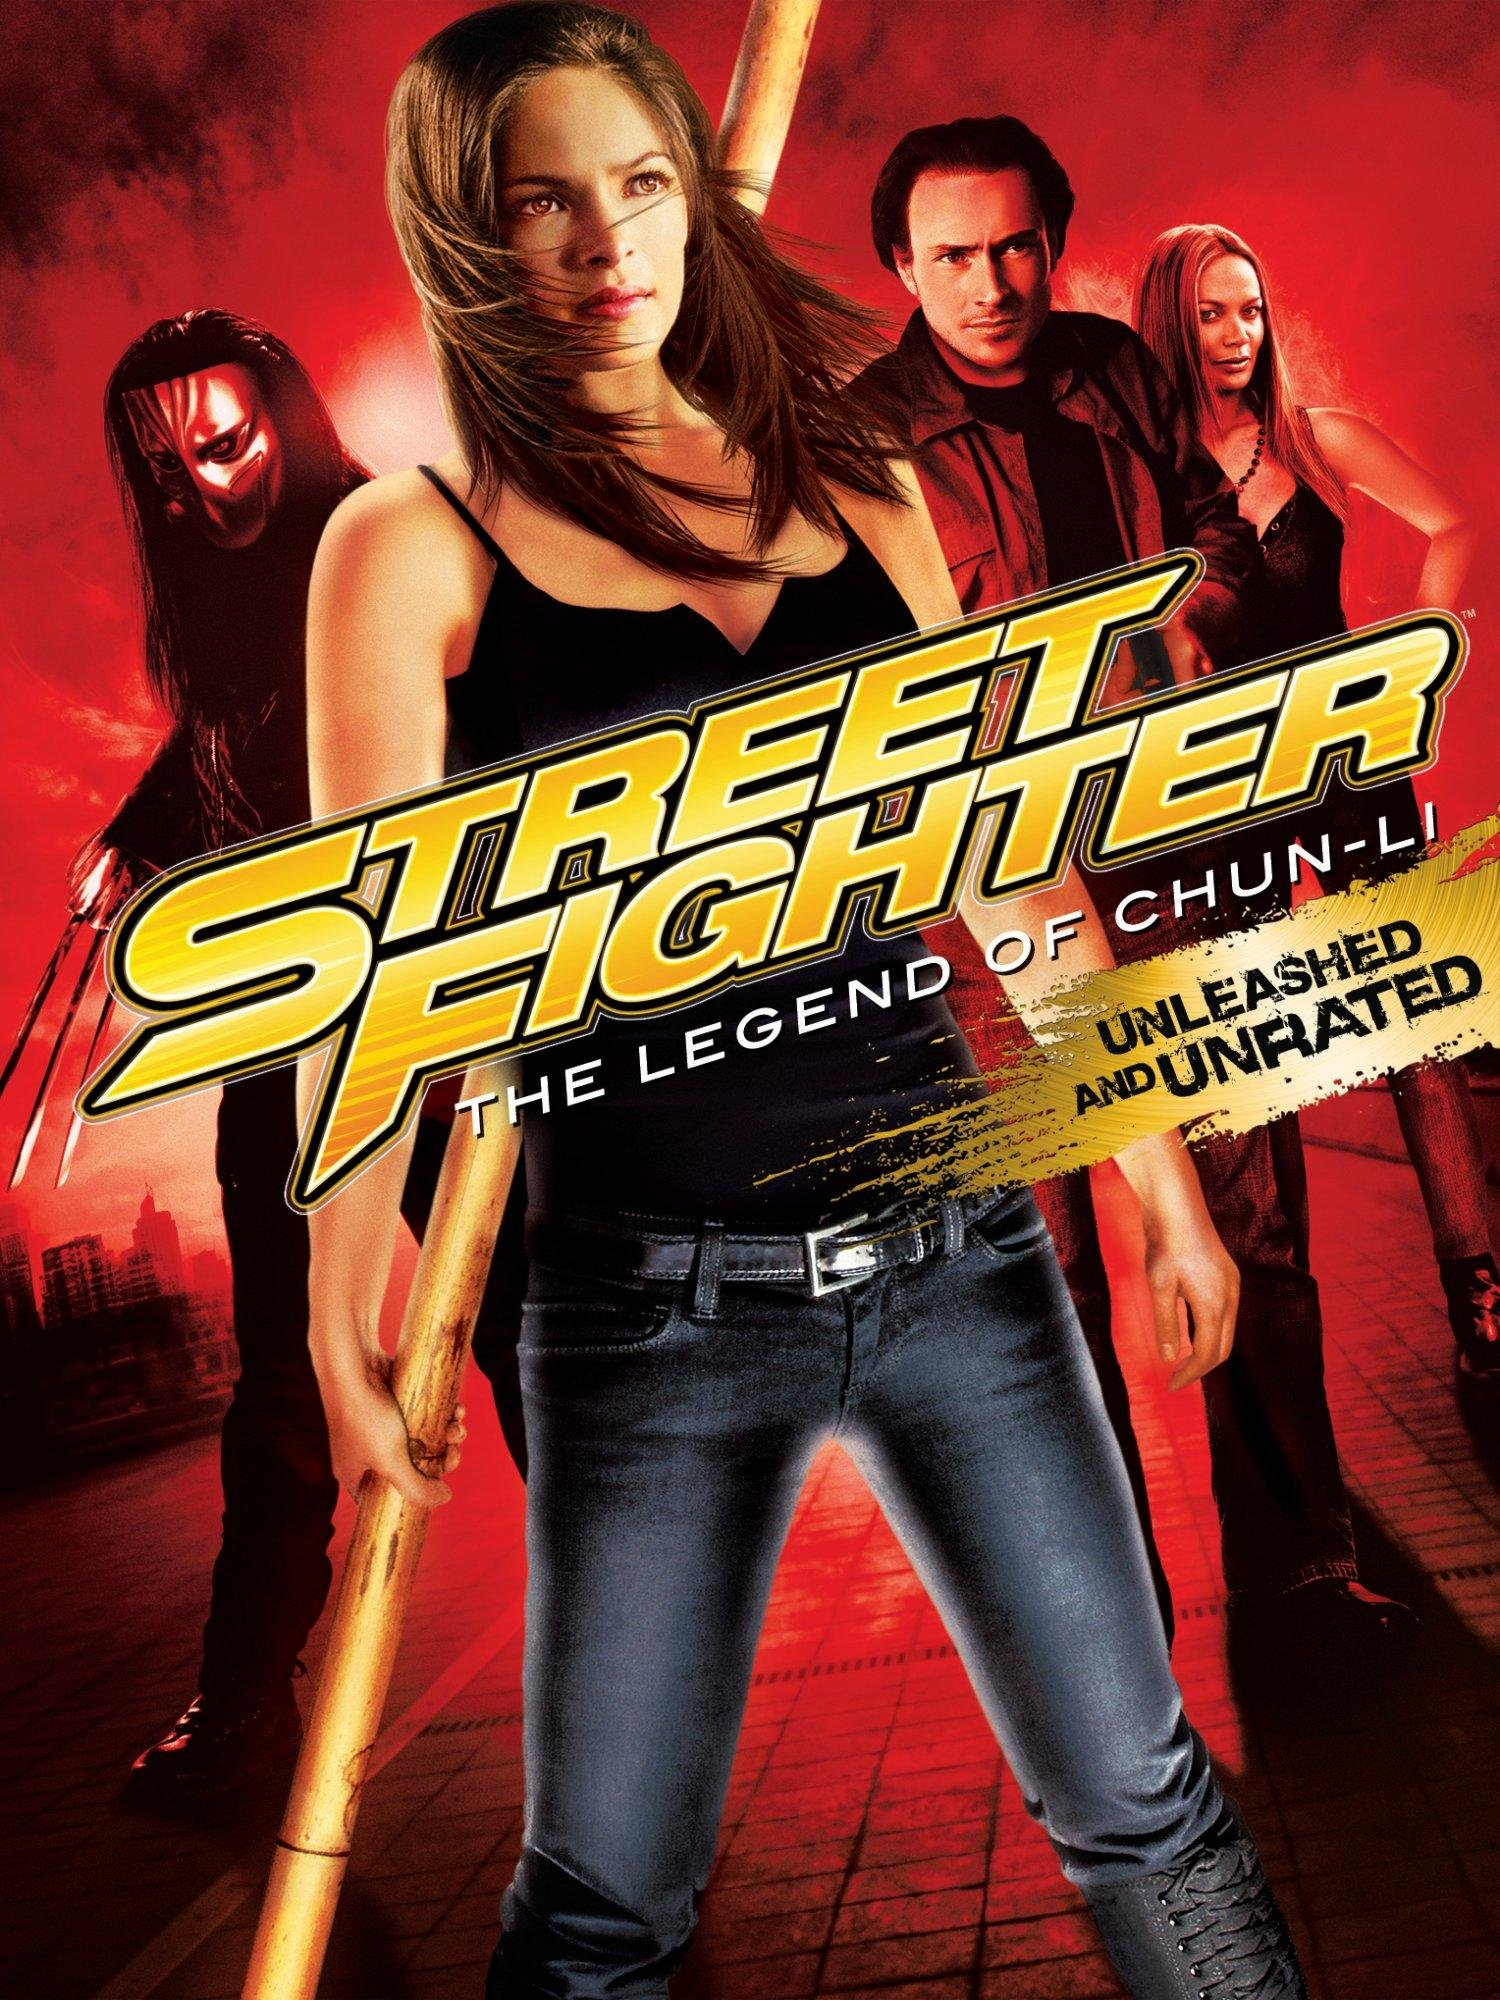 Amazon.com: Street Fighter: The Legend of Chun-Li UNRATED ...